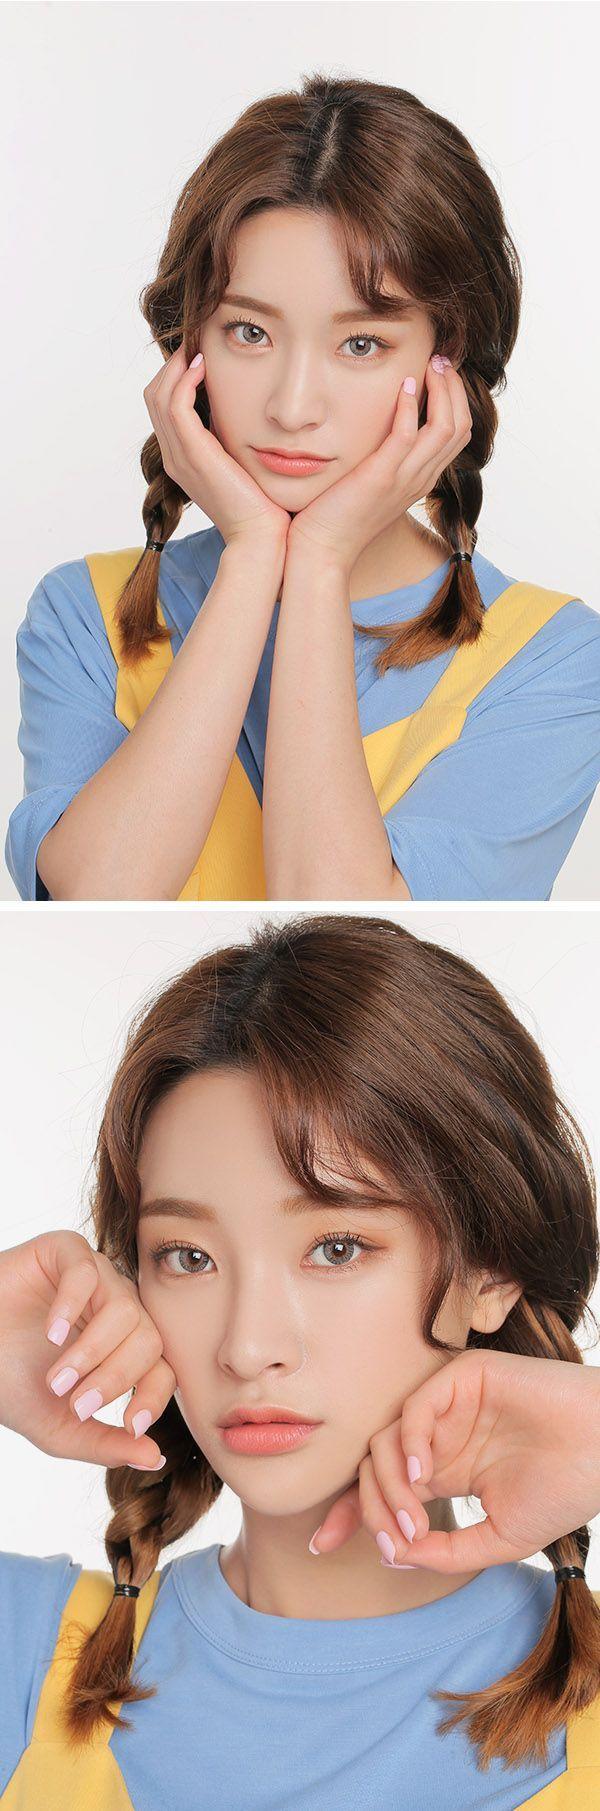 Byun Jungha Byeon Jeongha Model Korean Model